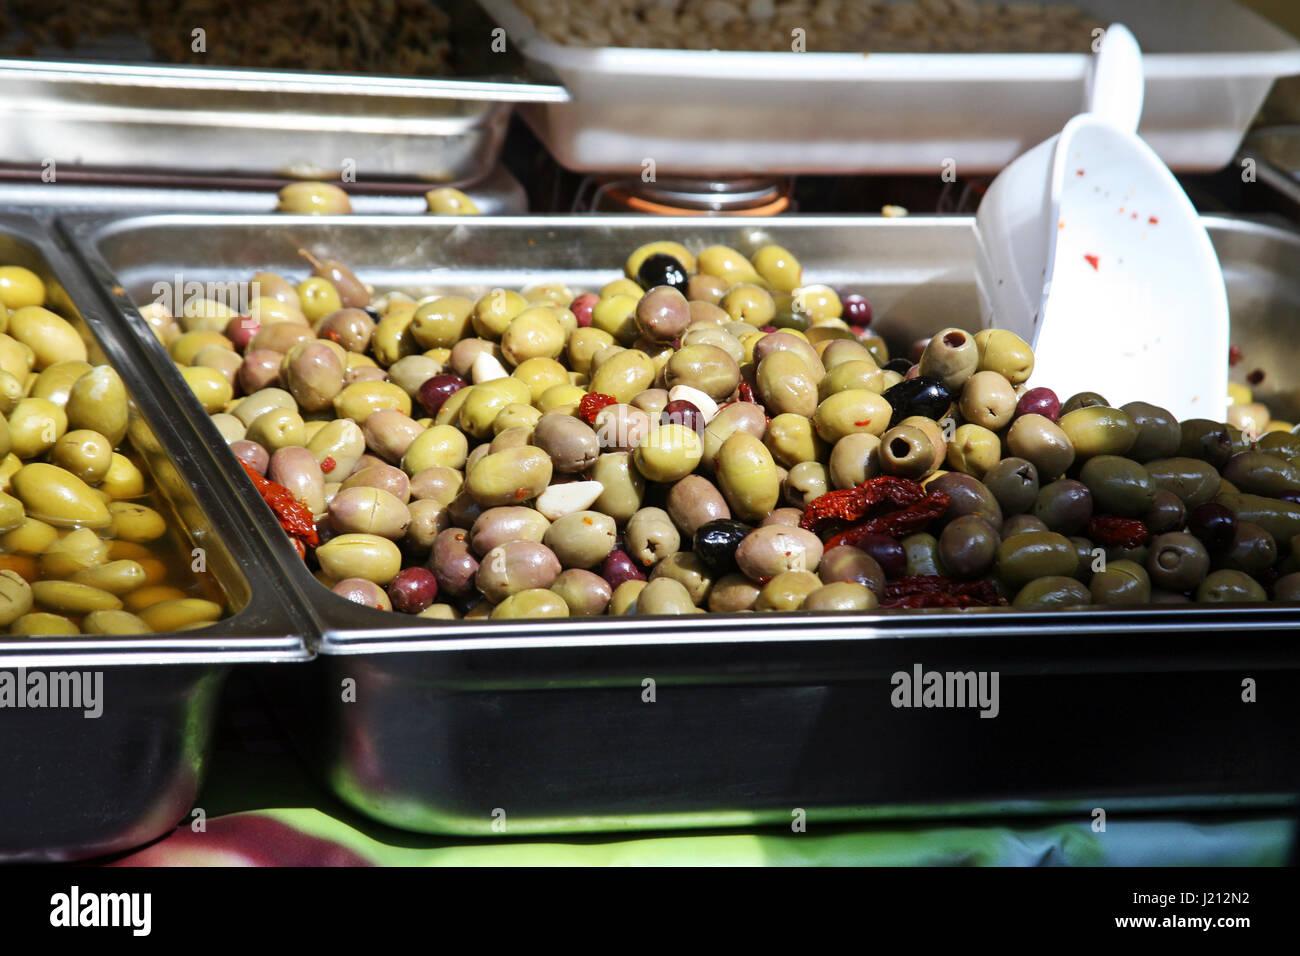 Italian delights,olives,springtime fair in Zagreb,Croatia,Europe,1 - Stock Image